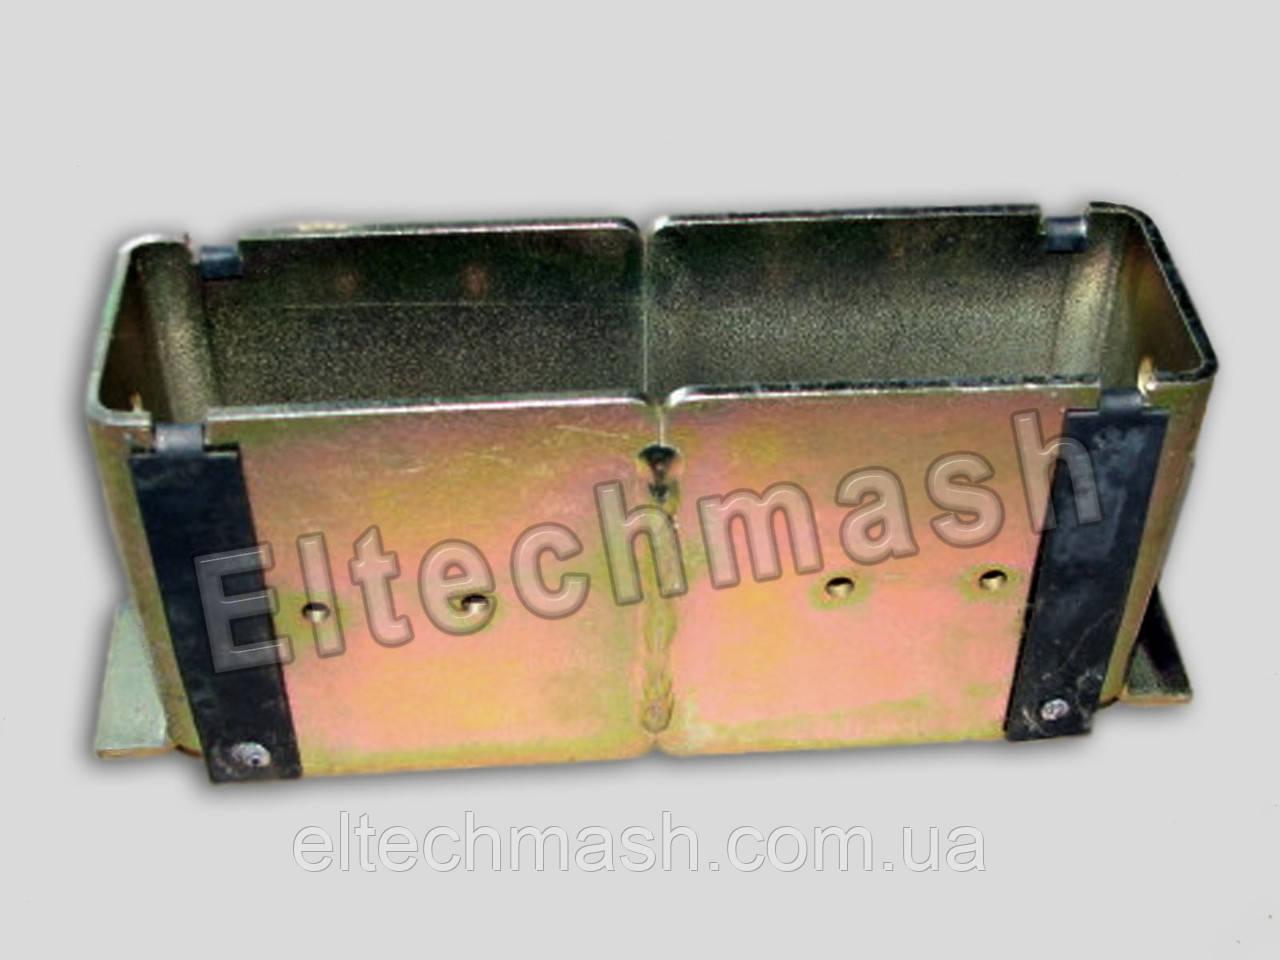 Коробка польстера 5ТХ.353.009 до ЭД-118А